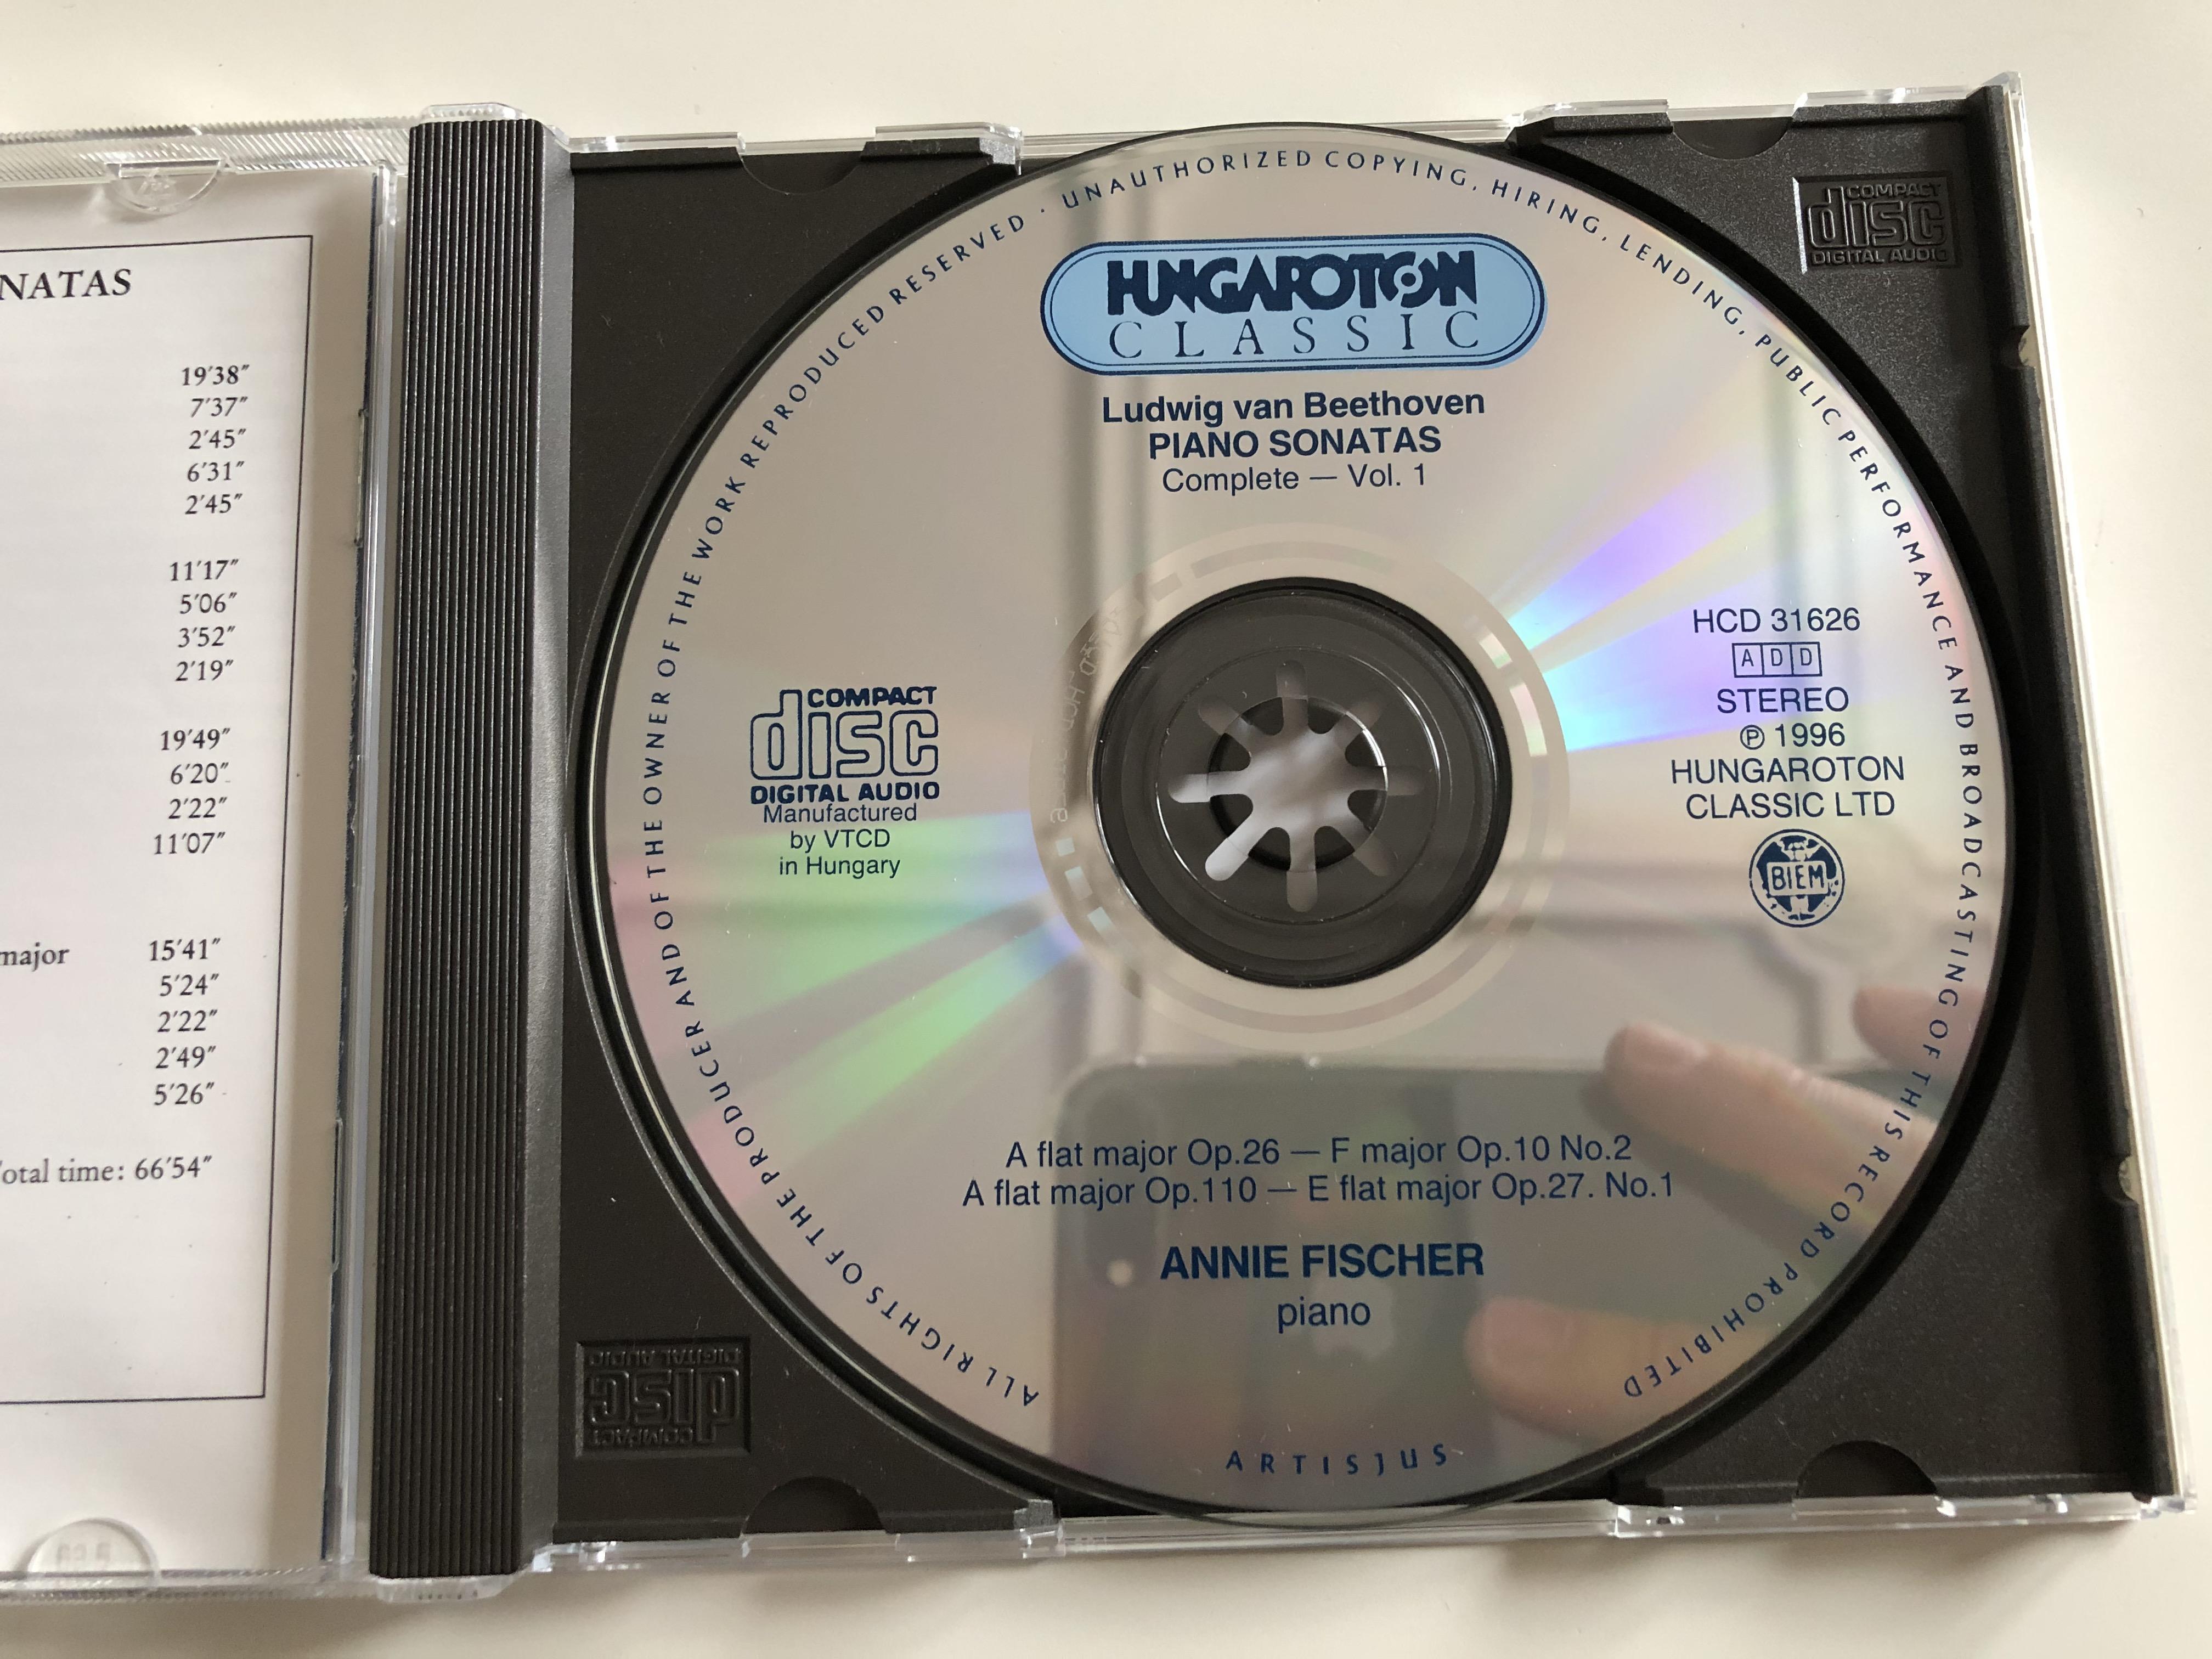 annie-fischer-ludwig-van-beethoven-piano-sonatas-complete-vol.-1-a-flat-major-op.-26-f-major-op.-102-a-flat-major-op.-110-e-flat-major-op.271-hungaroton-classic-audio-cd-1996-stereo-6-.jpg